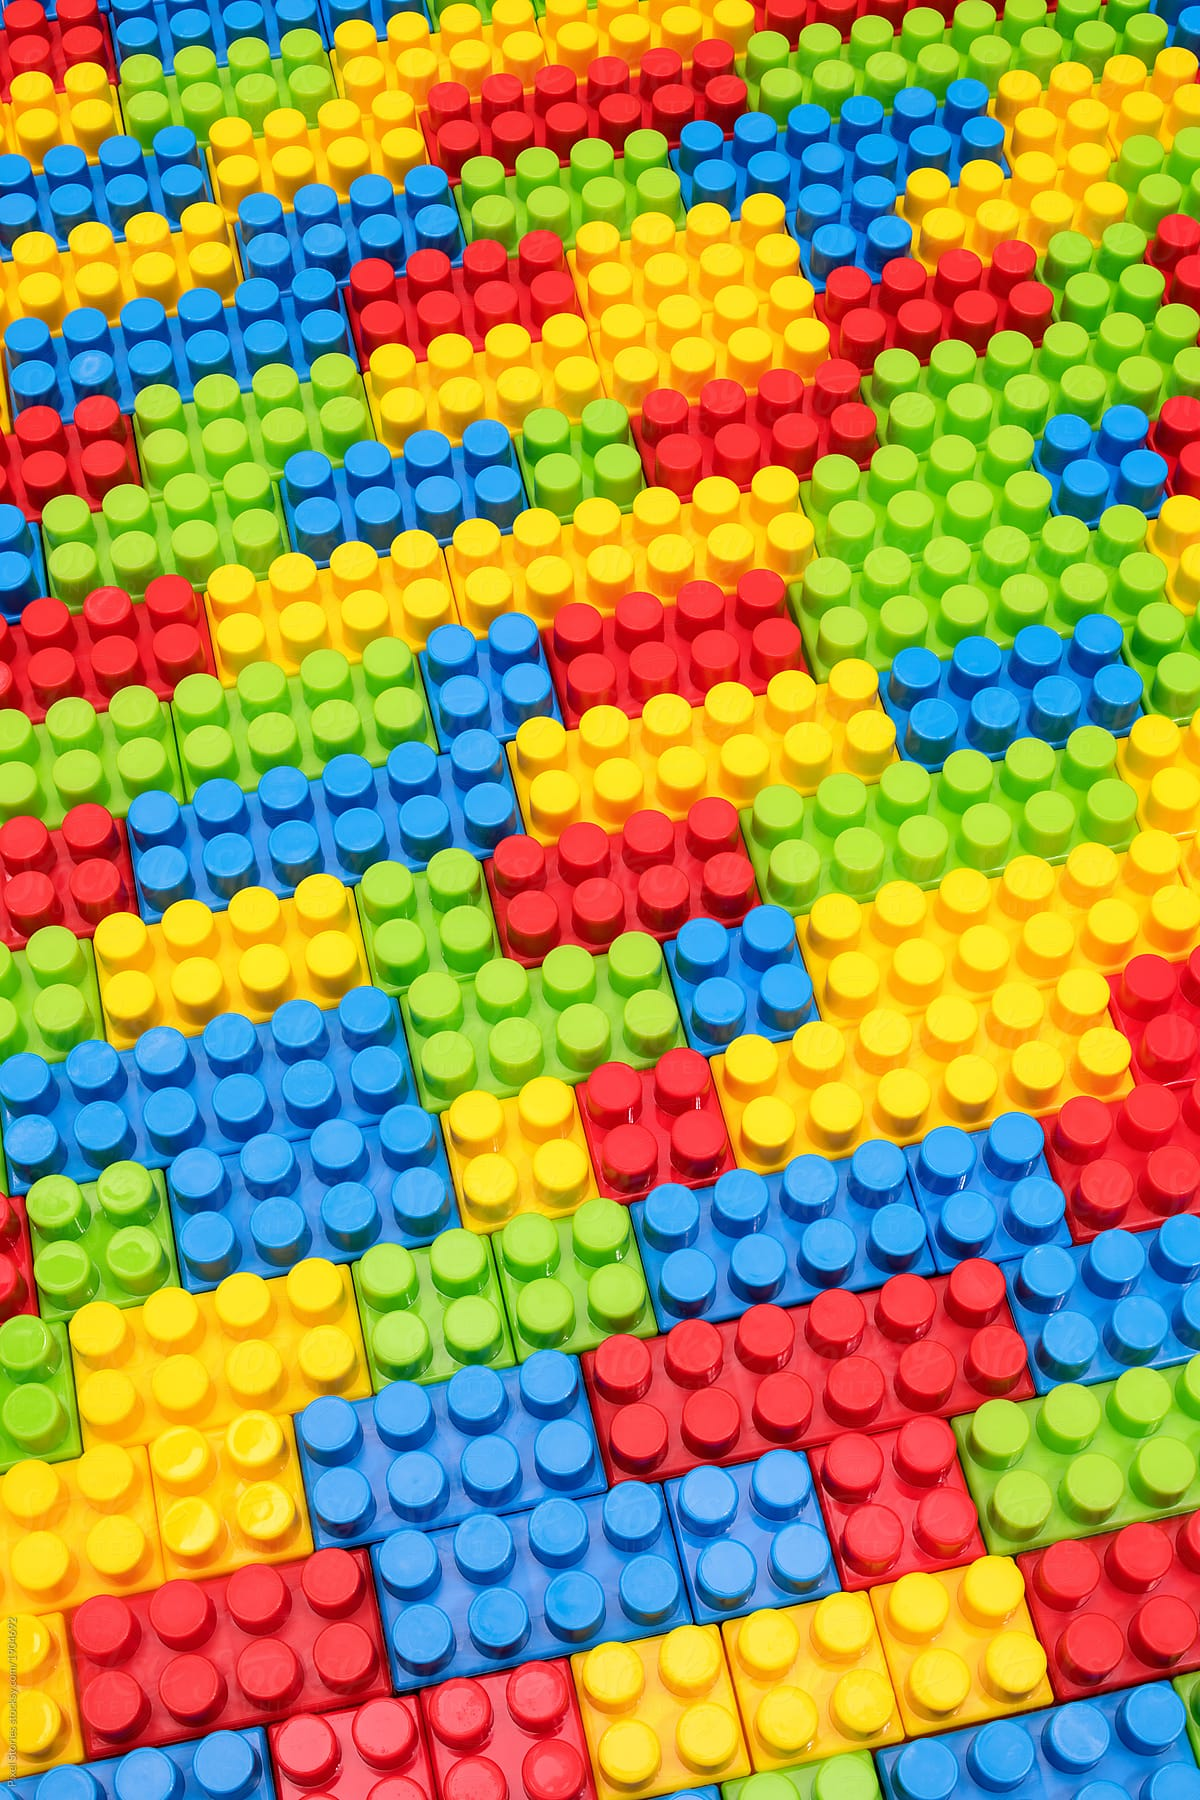 Stock Photo - Colorful Plastic Building Blocks Background